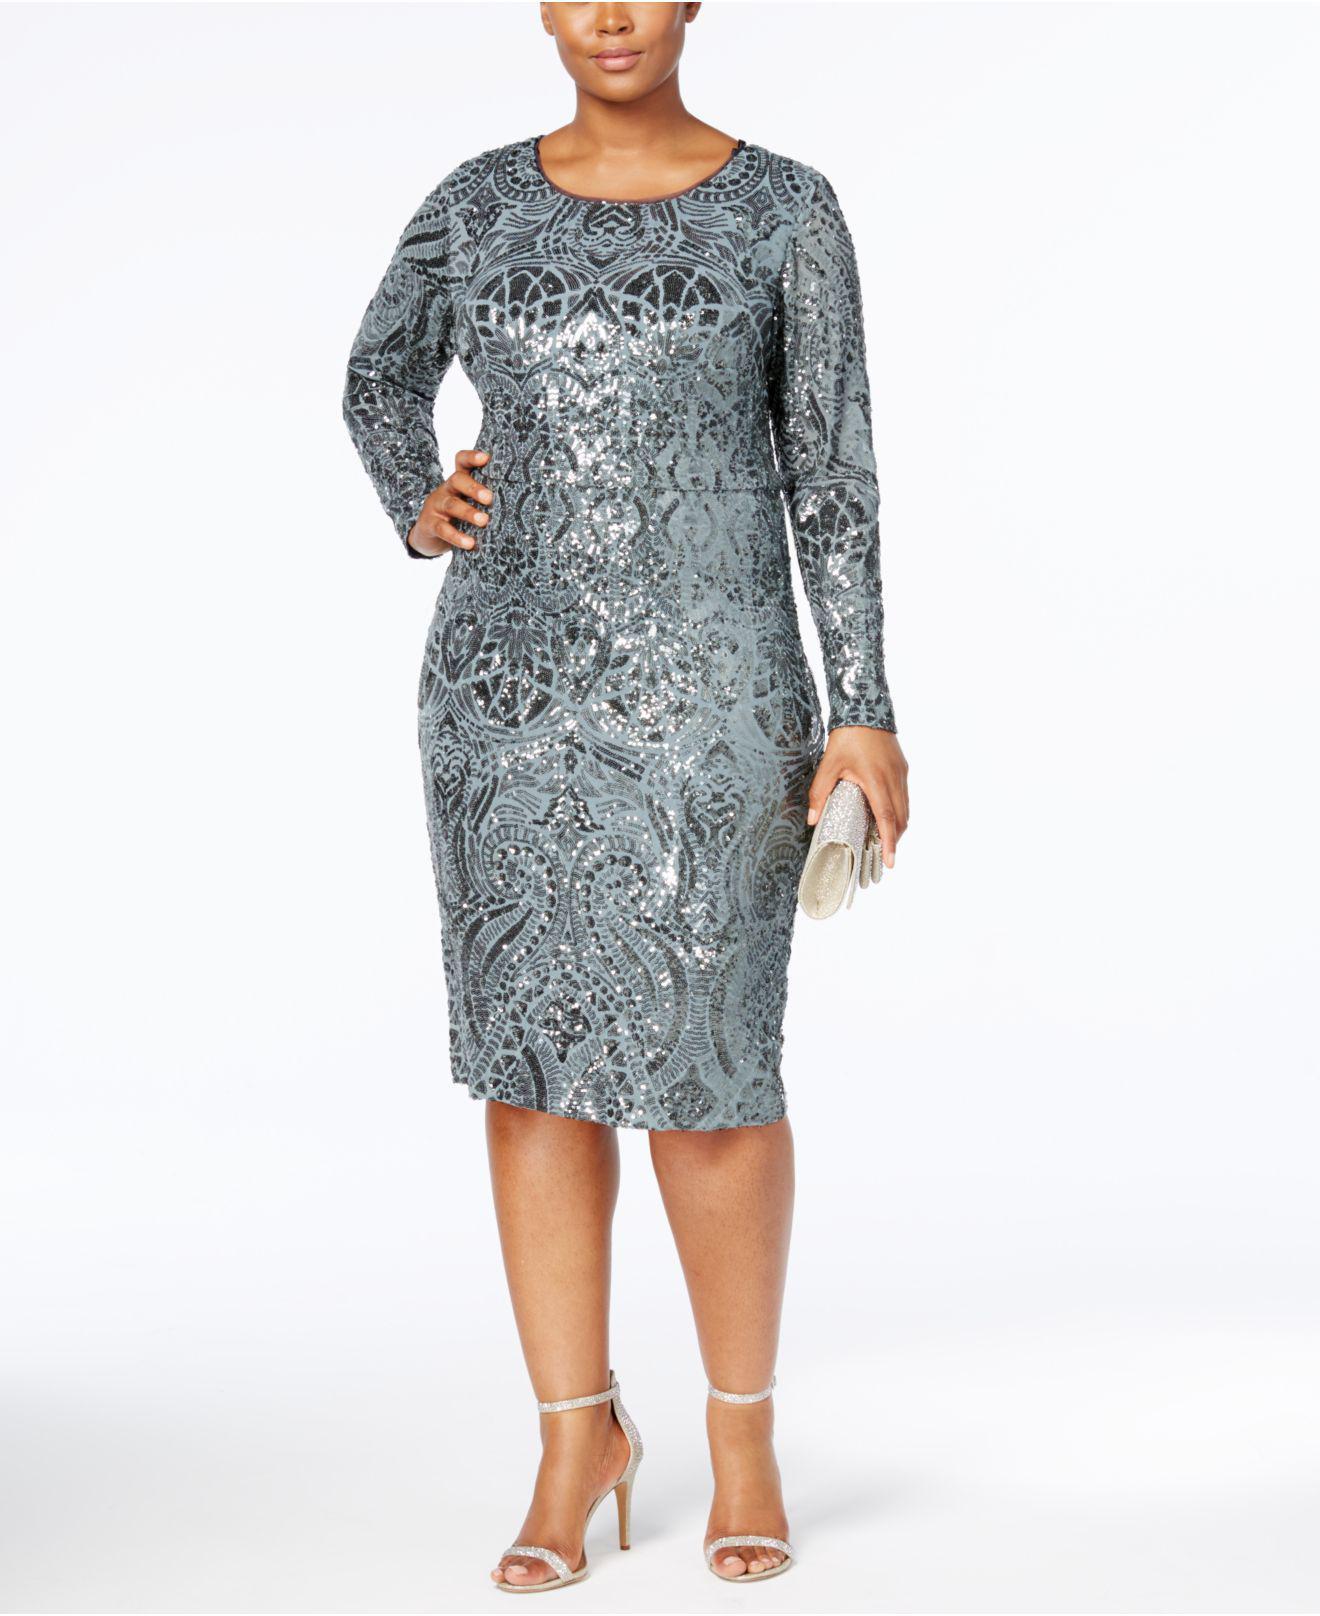 Betsy & Adam Plus Size Sequined Sheath Dress - Lyst